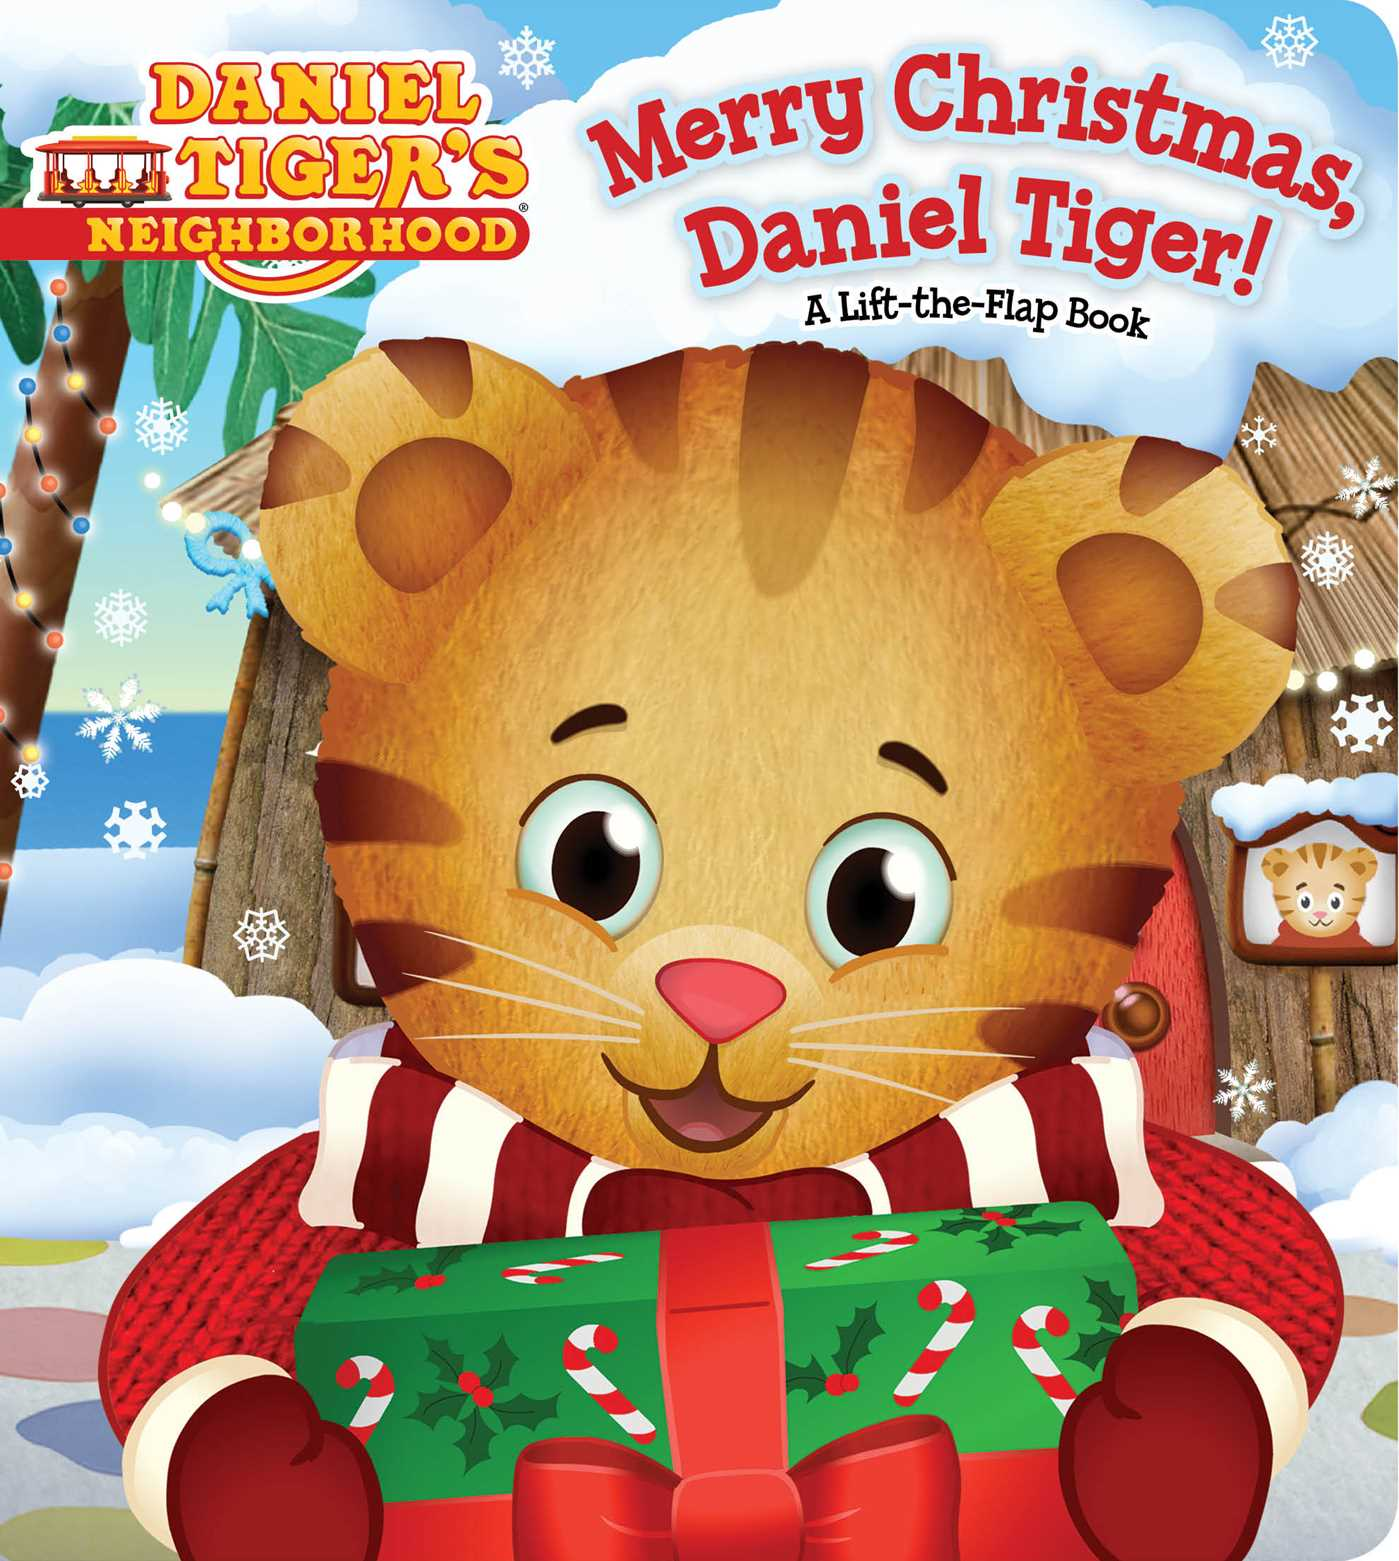 merry christmas daniel tiger book by angela c santomero jason fruchter official. Black Bedroom Furniture Sets. Home Design Ideas